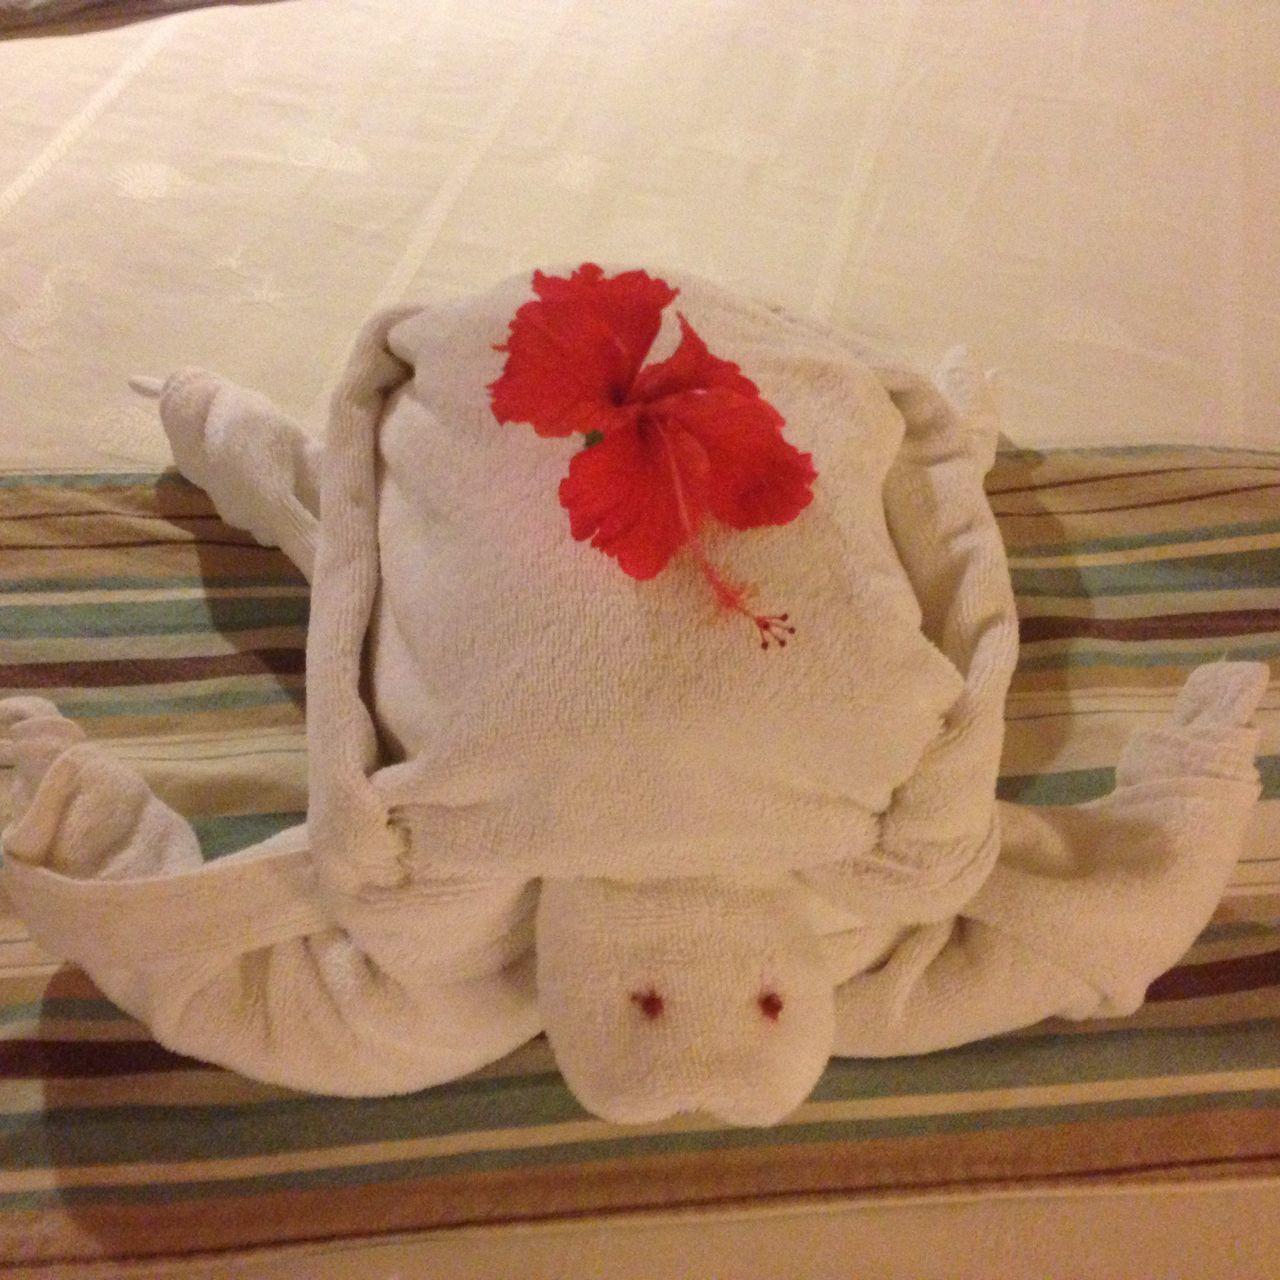 Towel Animal Enjoying Life